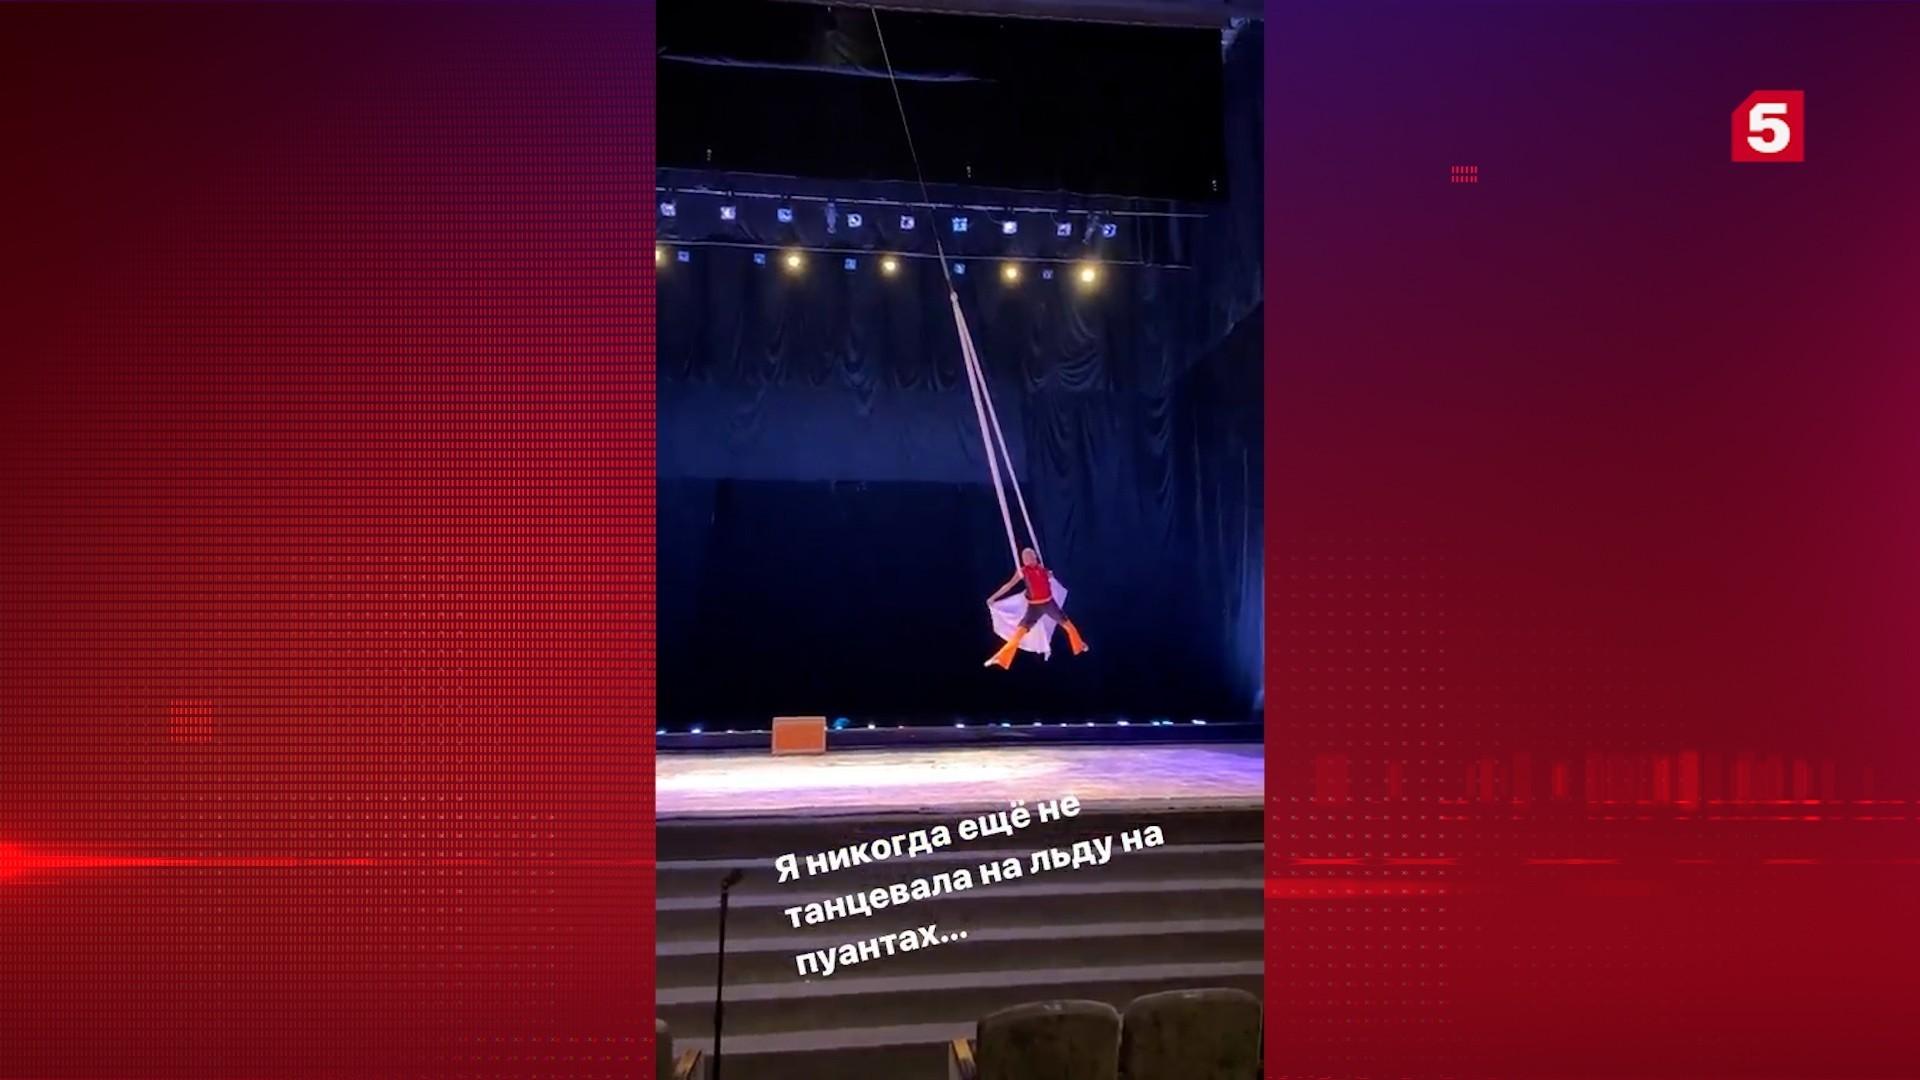 «Так скользко»: Анастасия Волочкова «вылетела» налед впуантах— видео